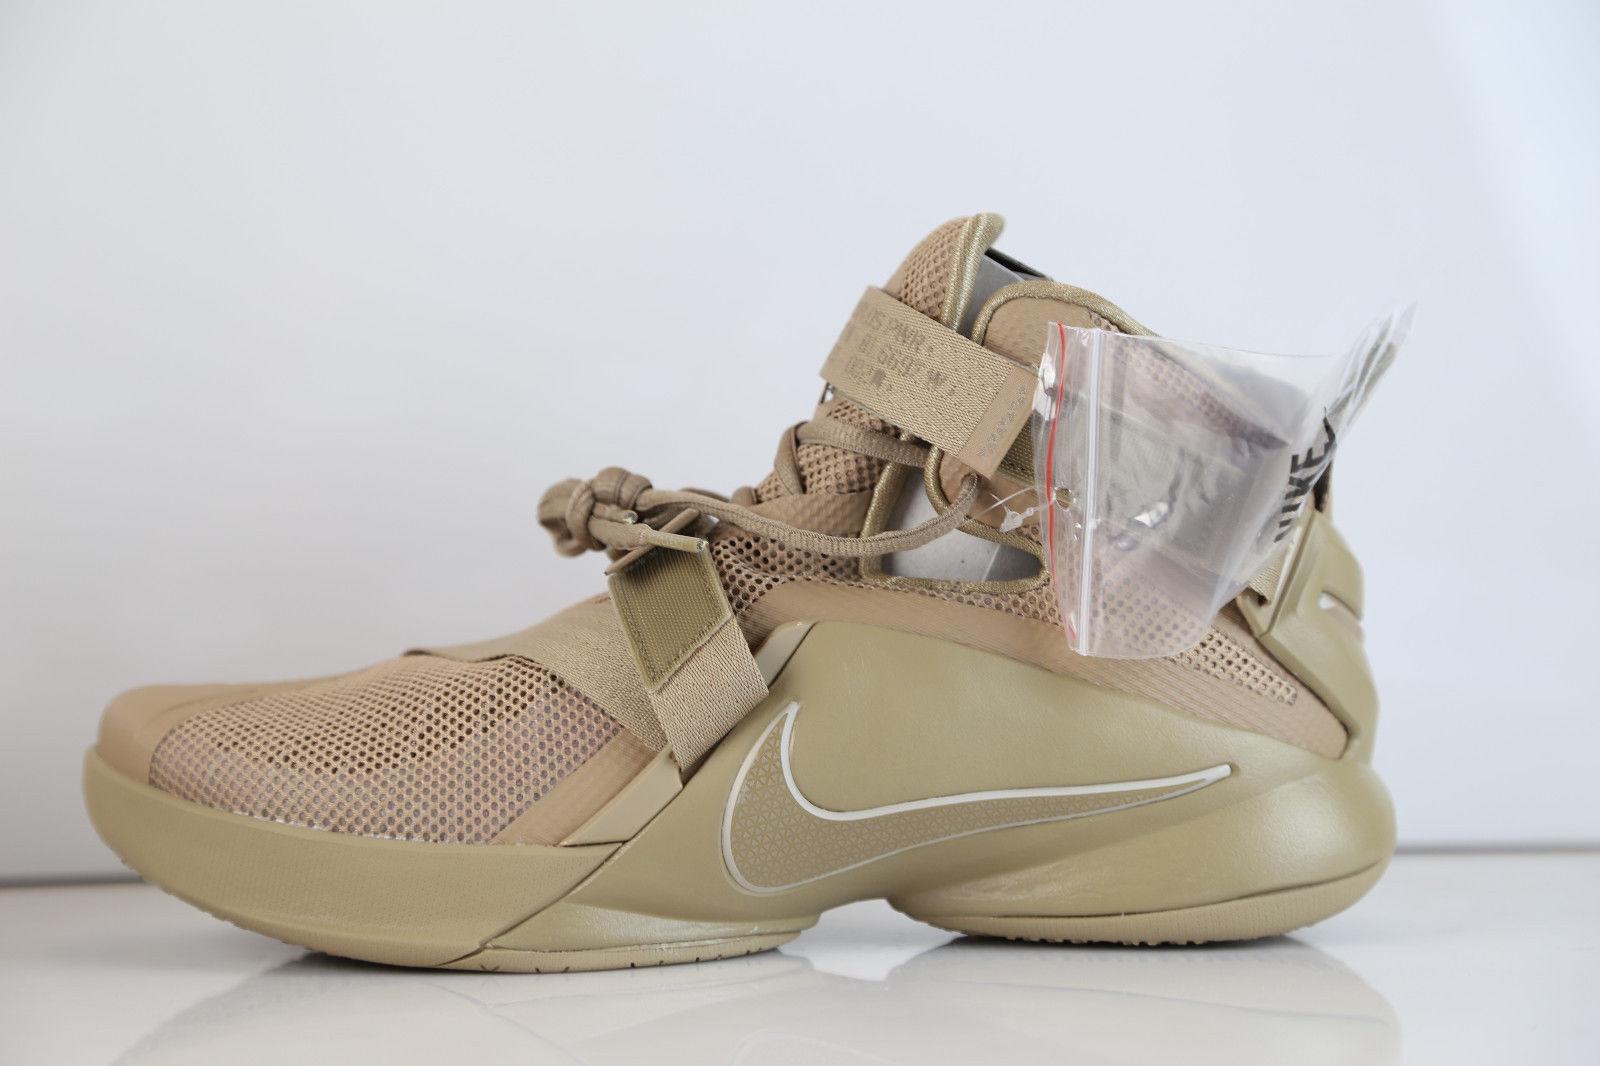 Nike Lebron Soldier 9 IX Premium Sneakers Men's New Desert Camo 749490-222 Sz 15